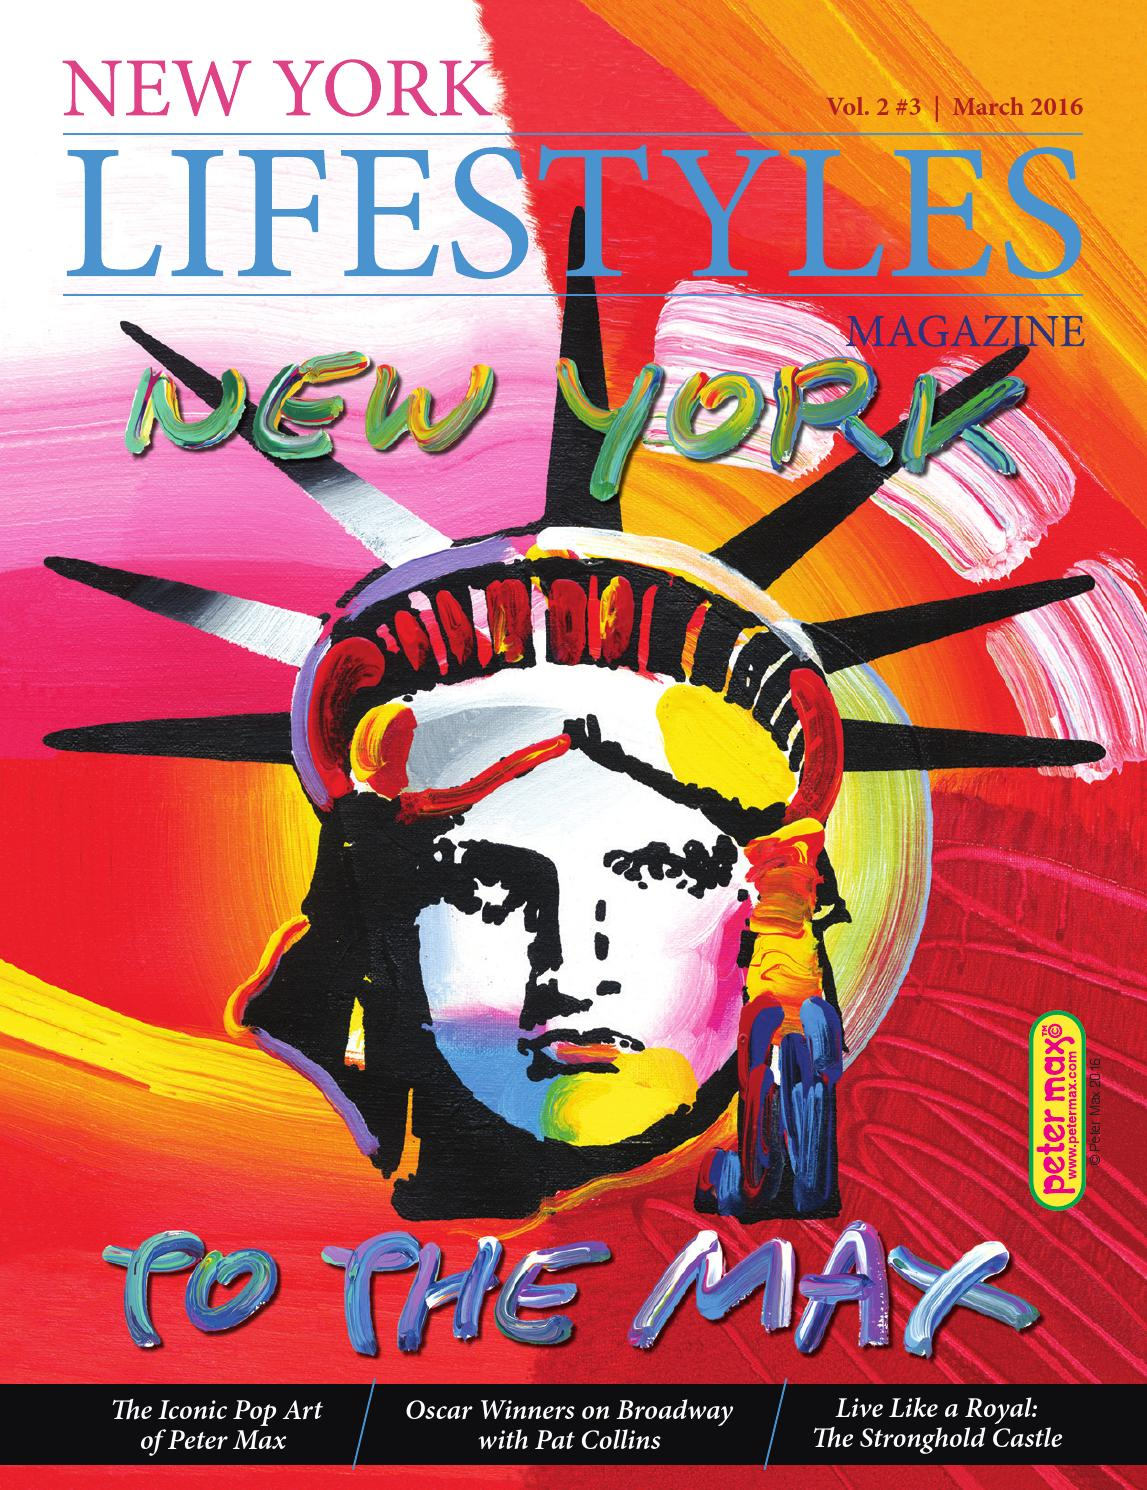 New York Lifestyles Magazine - March 2016 by New York Lifestyles Magazine -  issuu 6388c5695a75